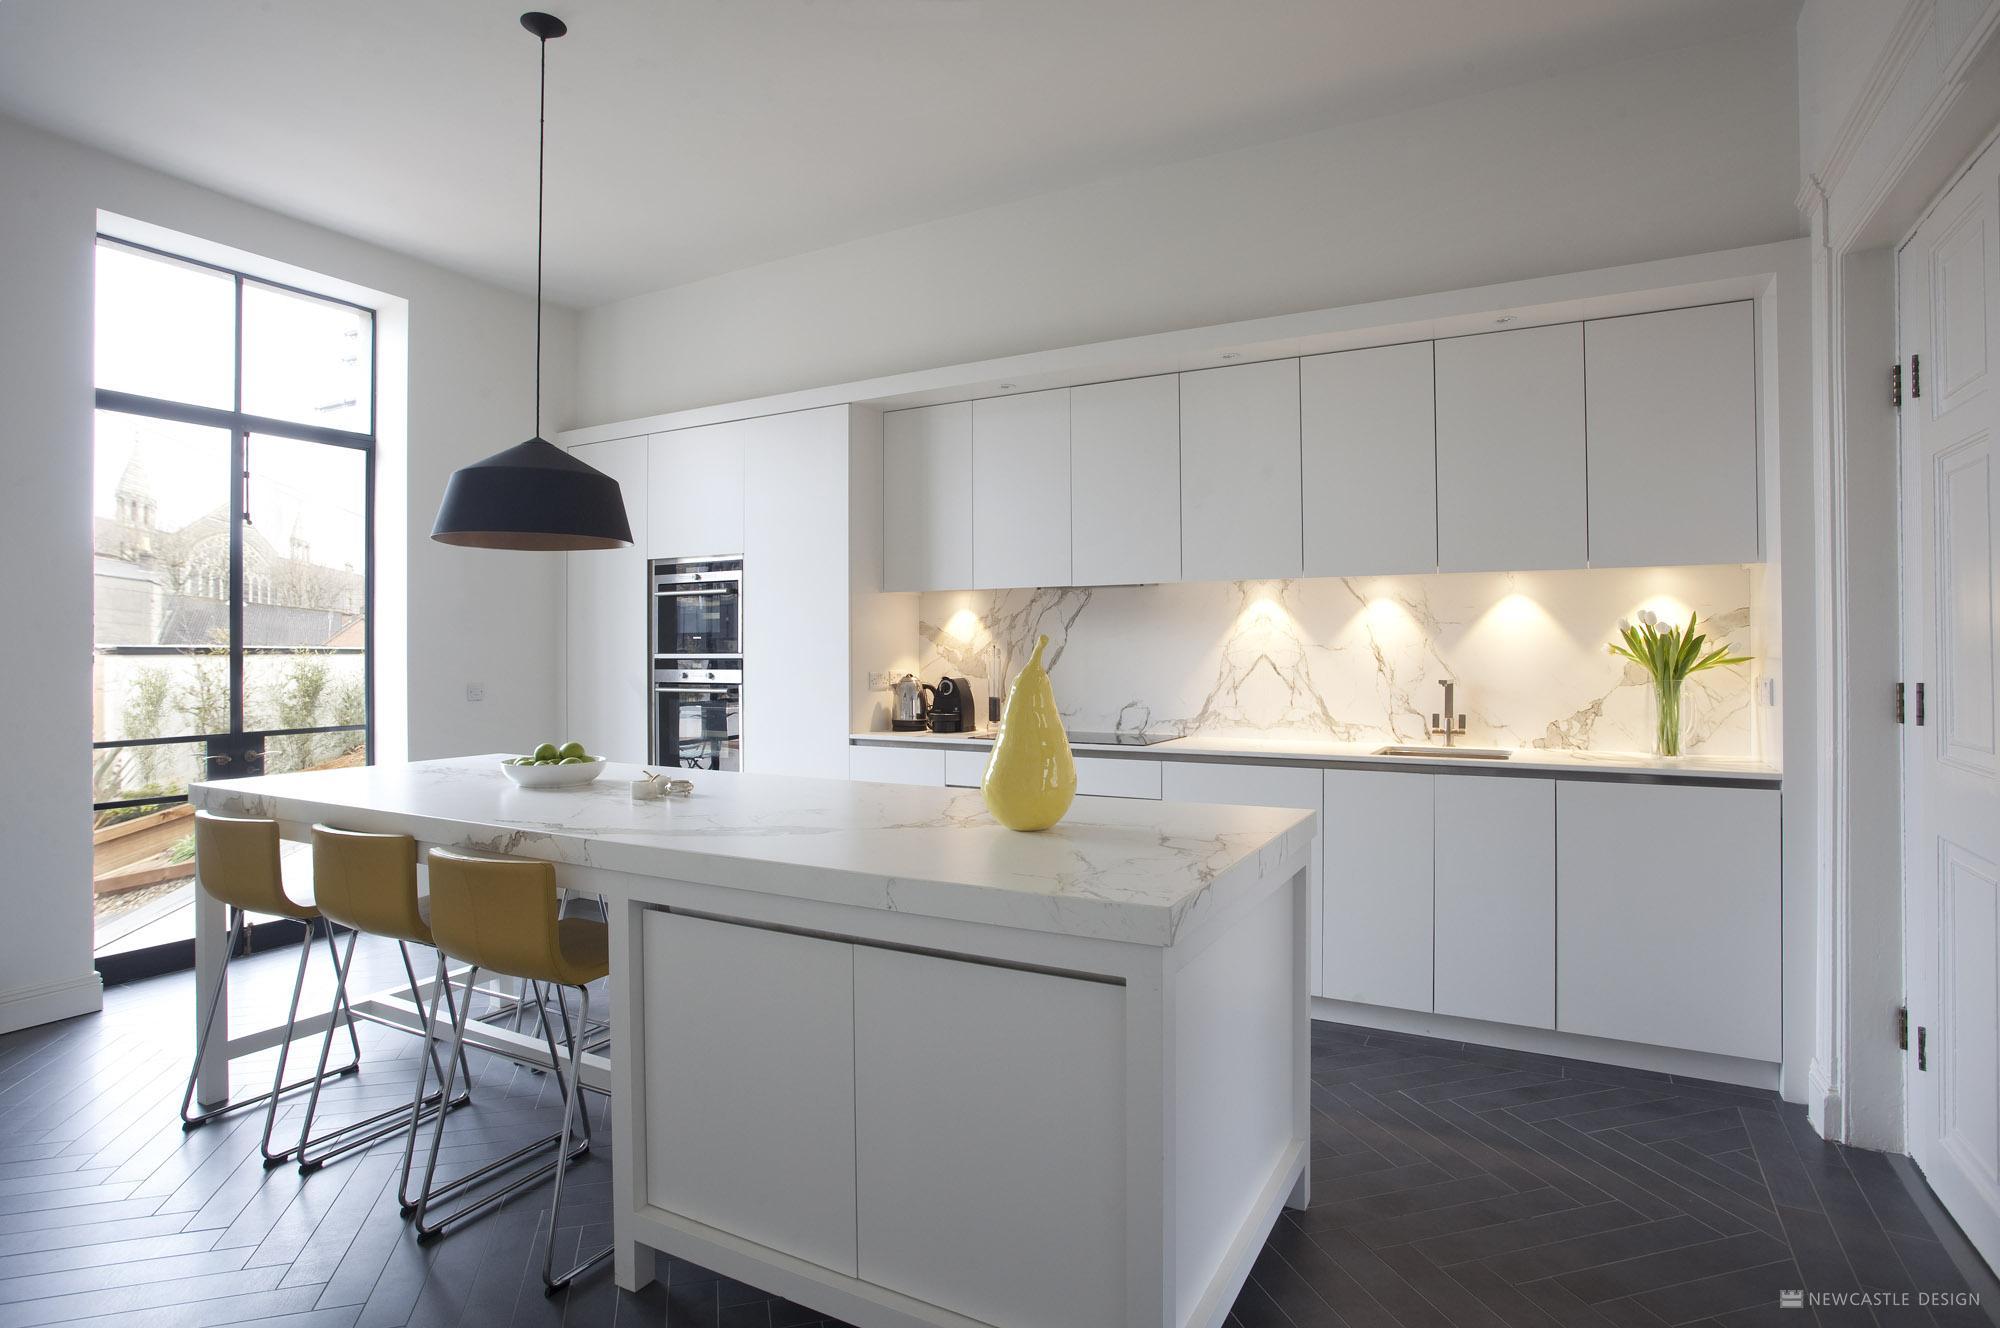 Contemporary Georgian Kitchen in Ireland from Newcastle Design on Modern Kitchen  id=83653